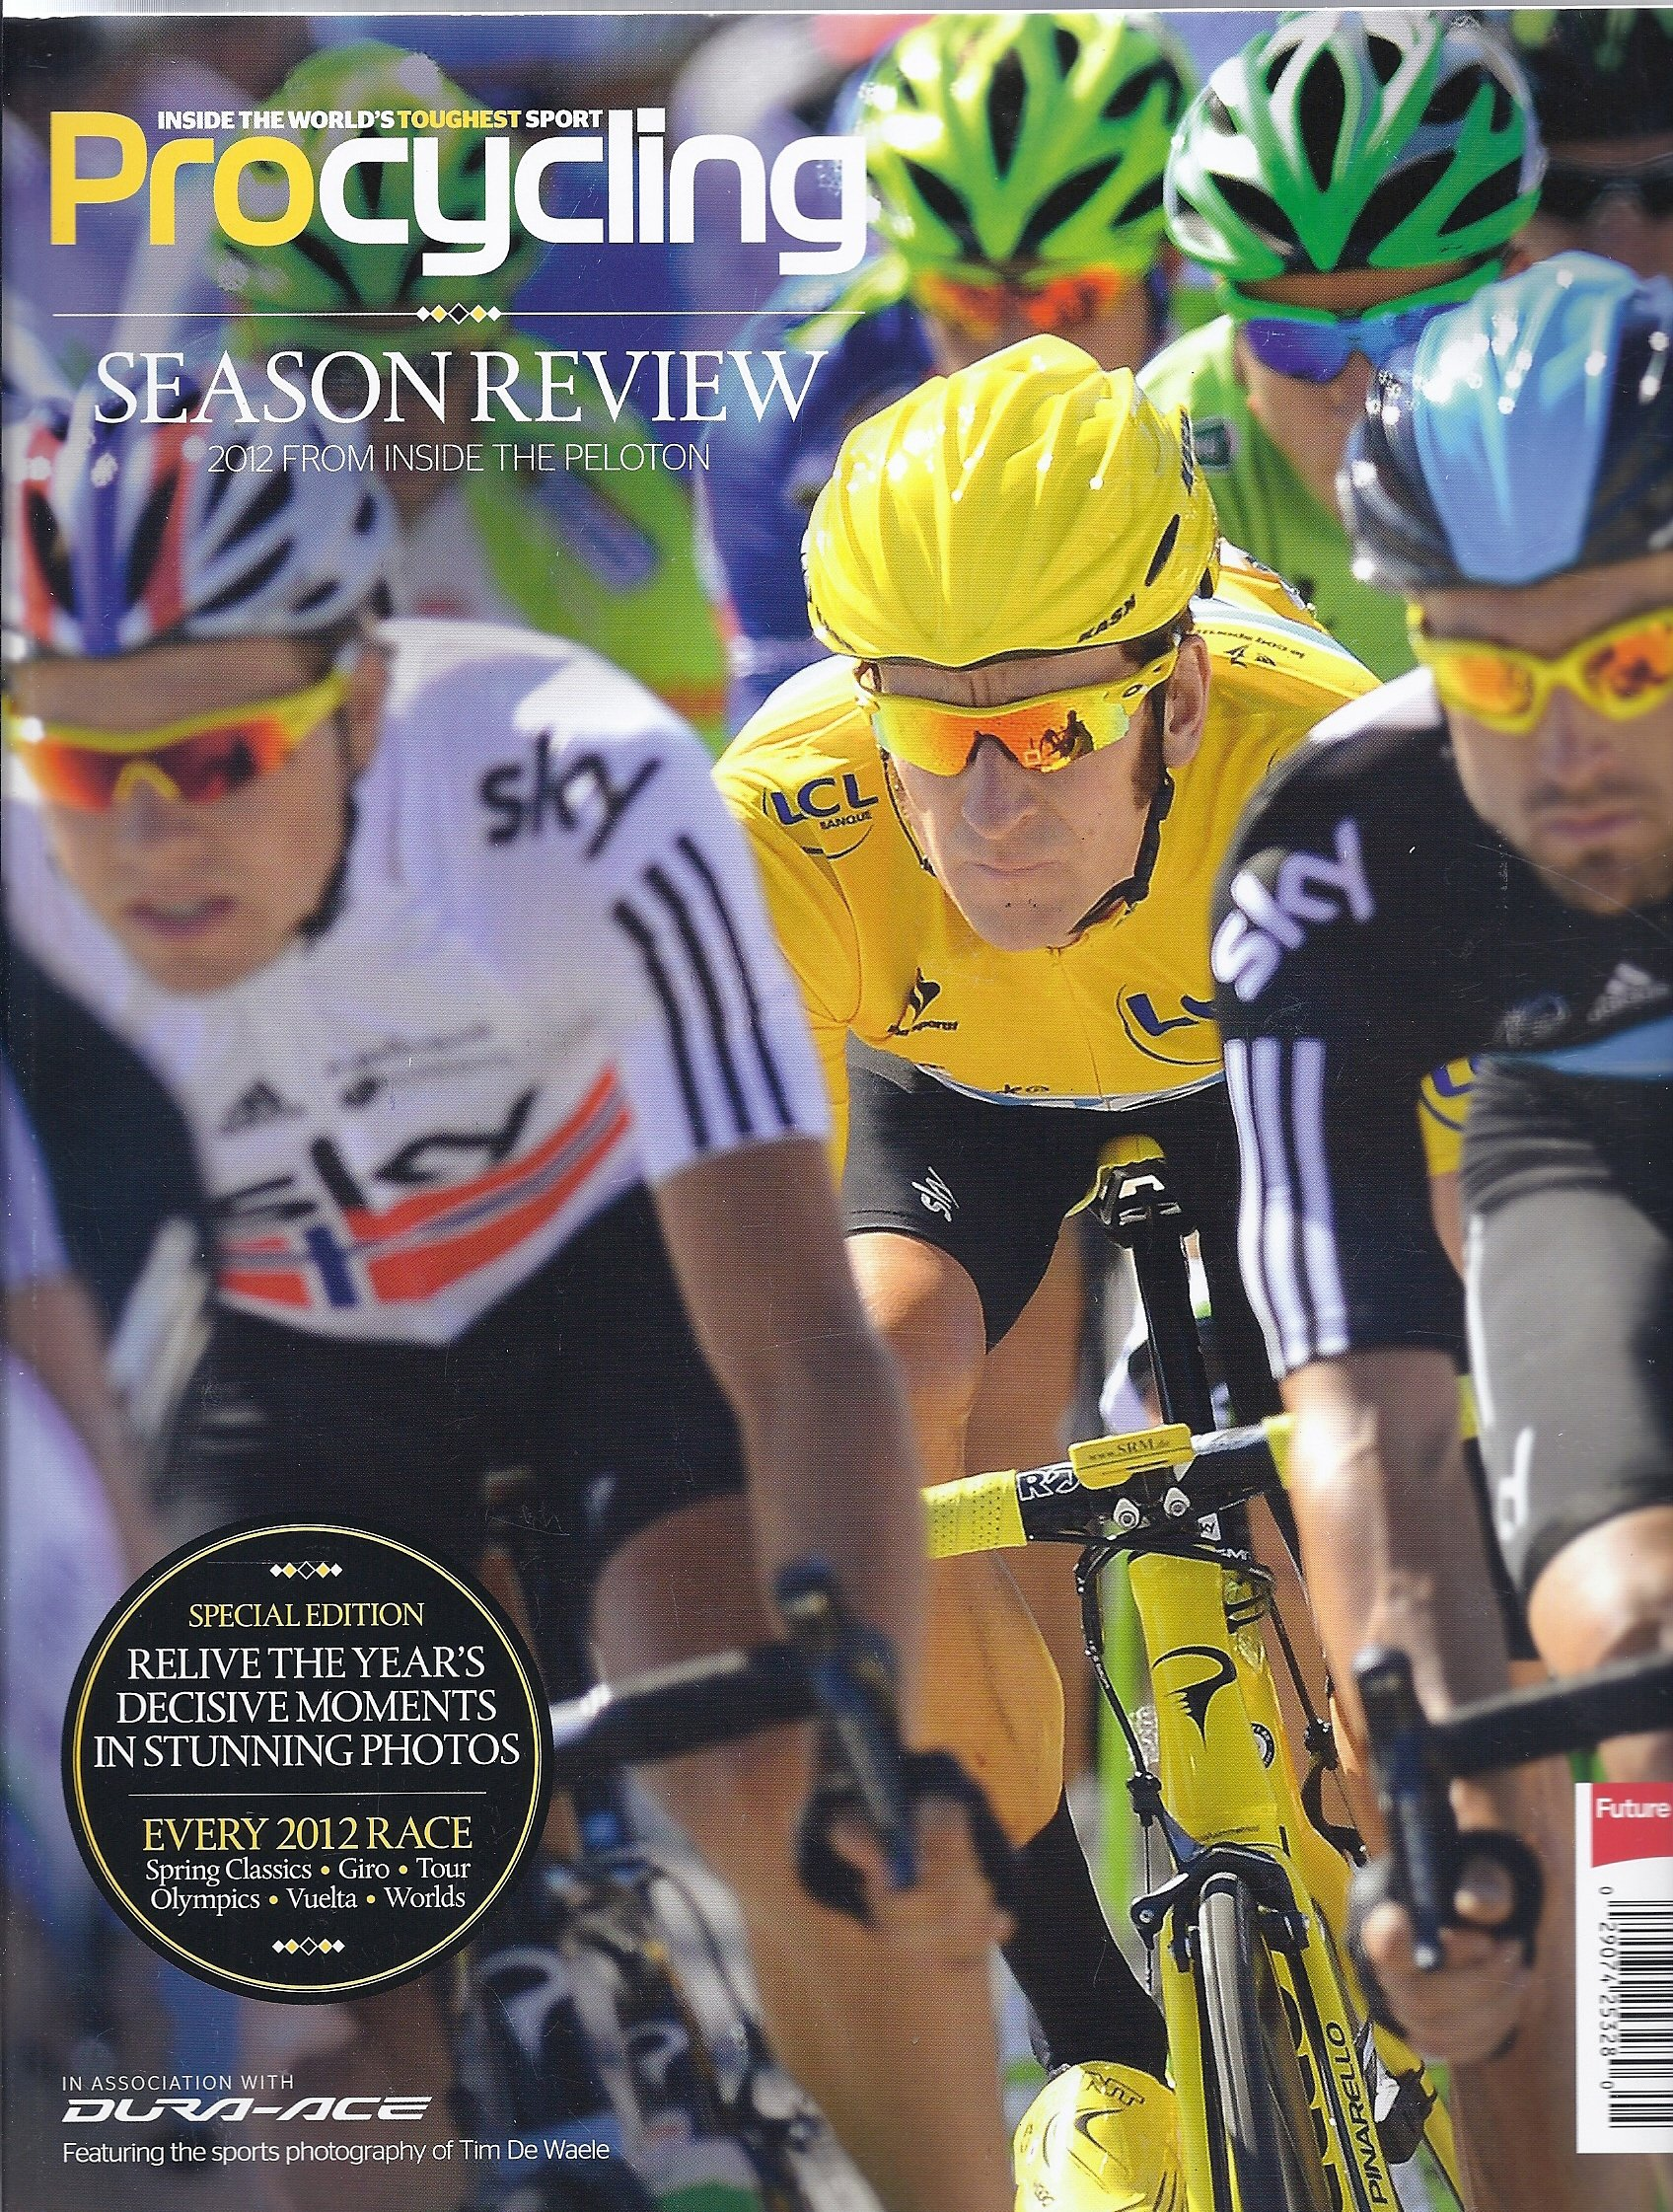 Procycling Magazine (Season Review 2012) ebook